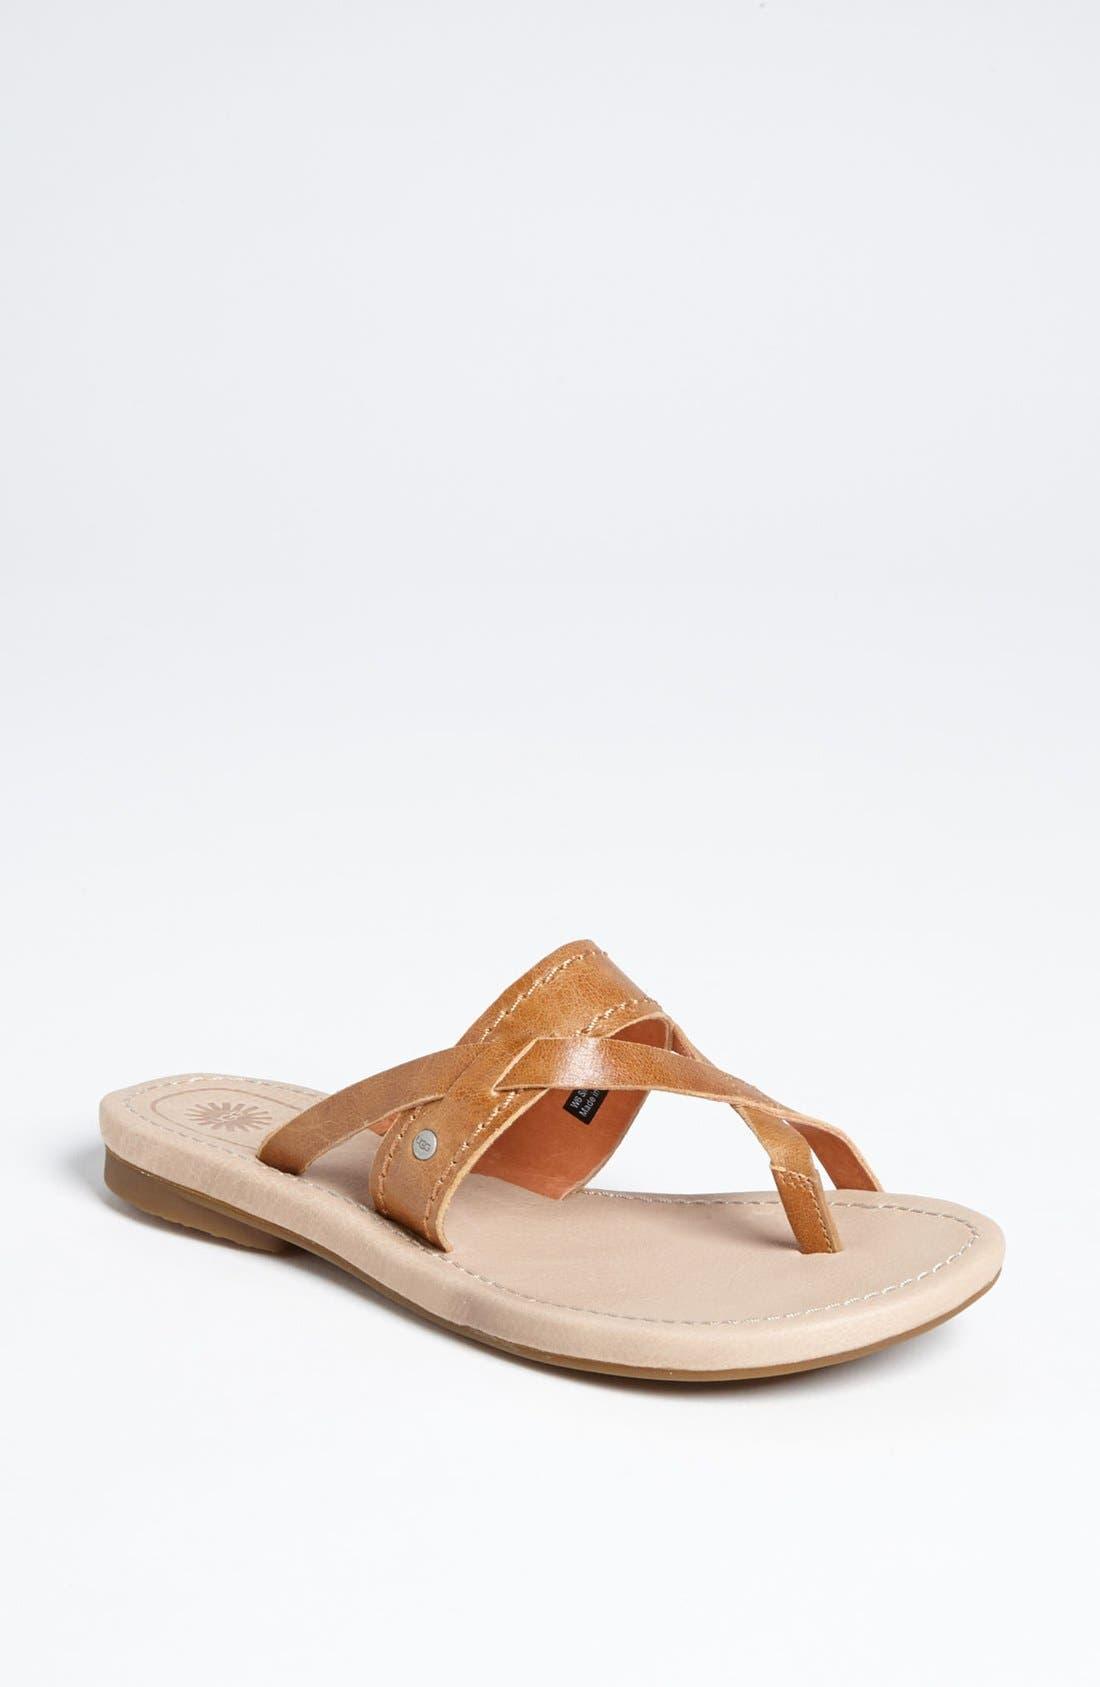 Alternate Image 1 Selected - UGG® Australia 'Mireya' Sandal (Women)